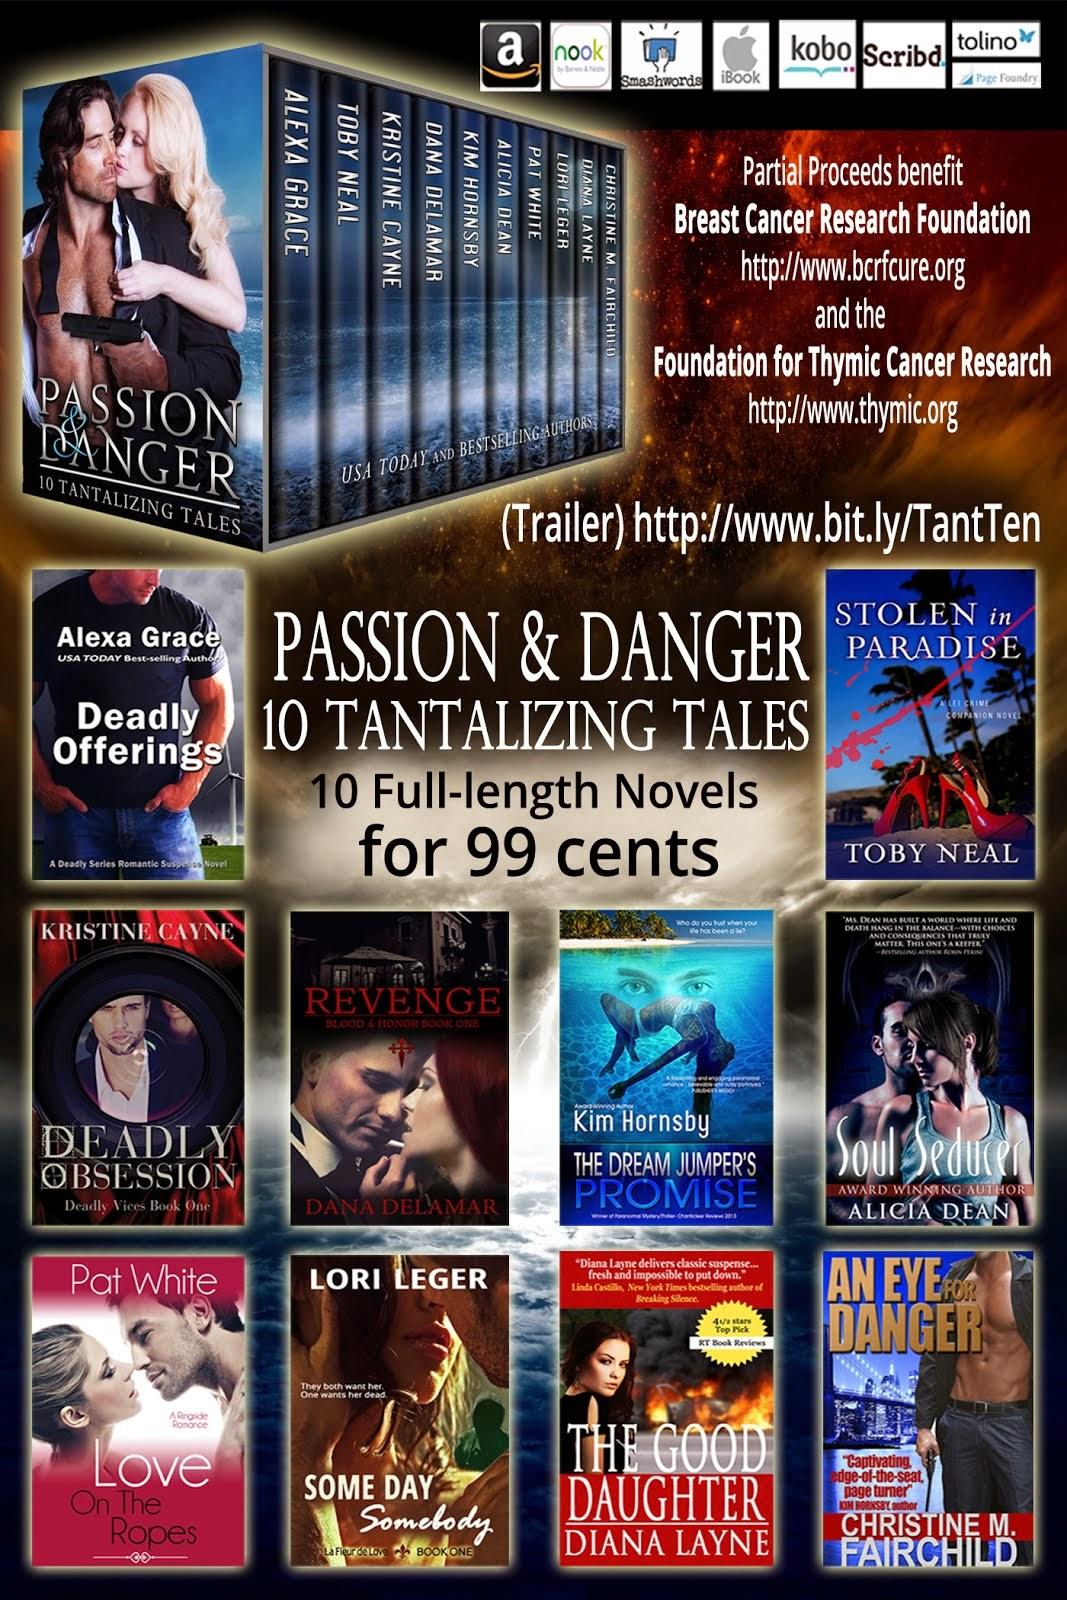 Passion & Danger